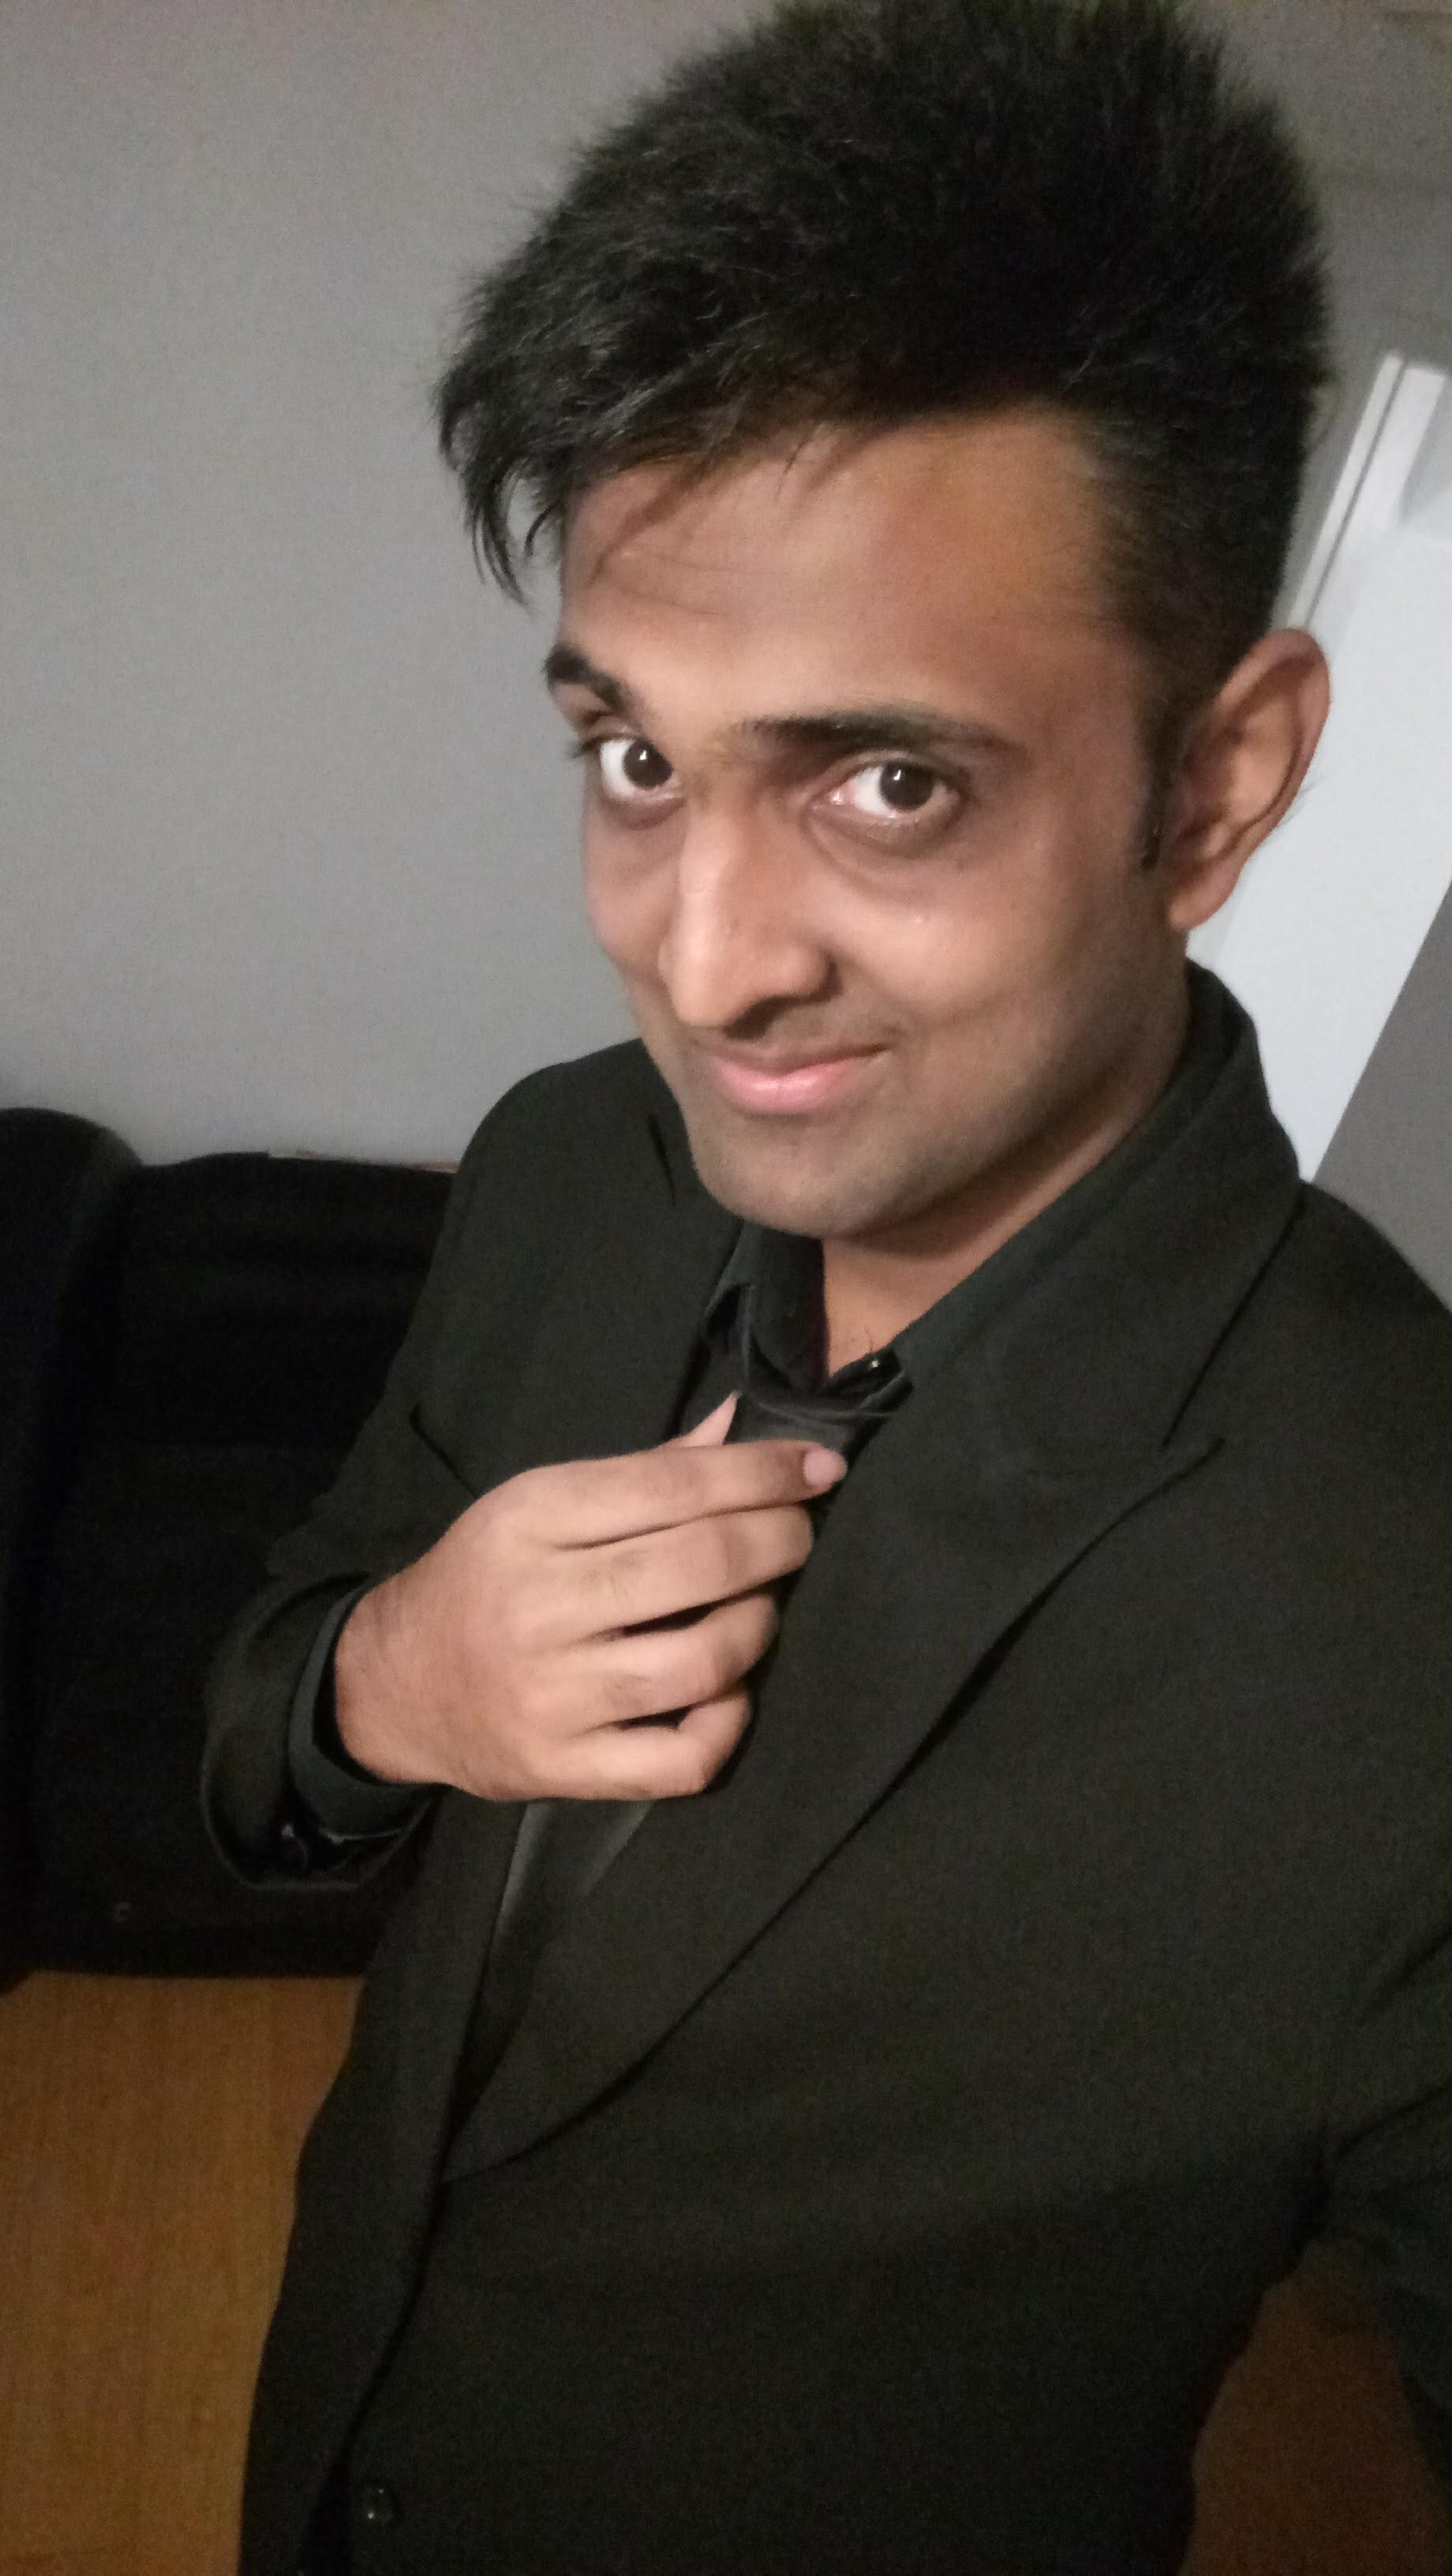 Sriharish Mathanagopalsamy - Compositor